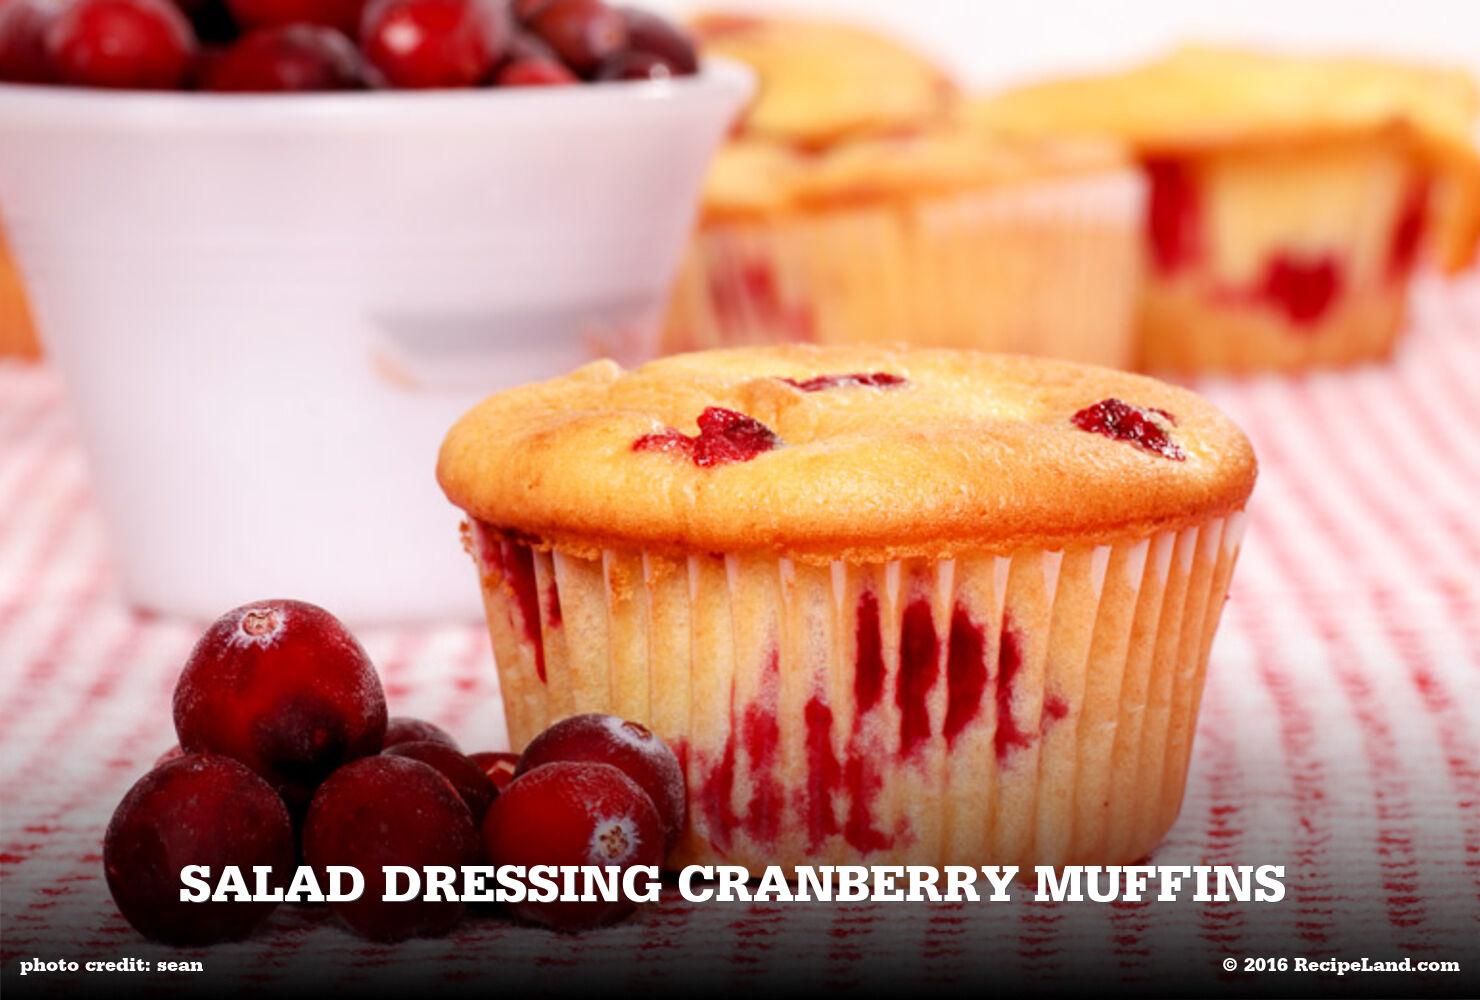 Salad Dressing Cranberry Muffins